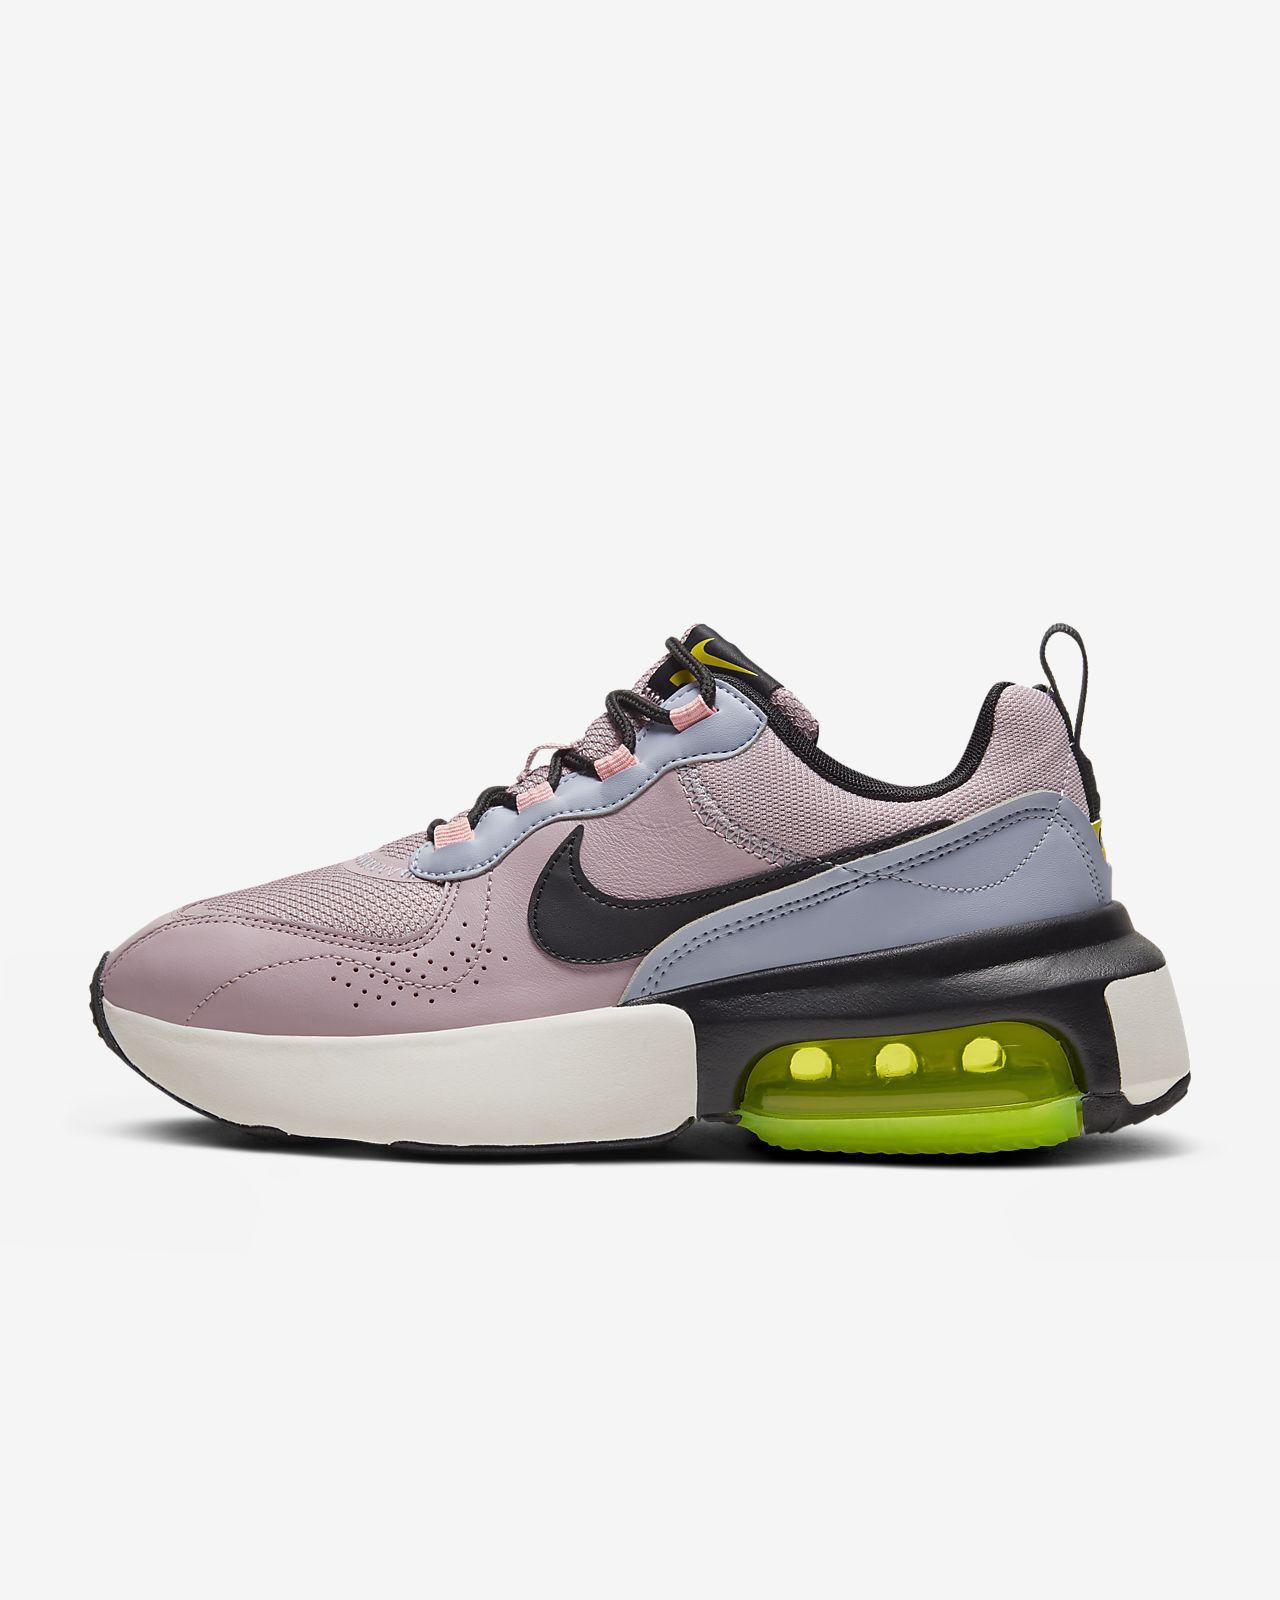 Sapatilhas Nike Air Max Verona para mulher